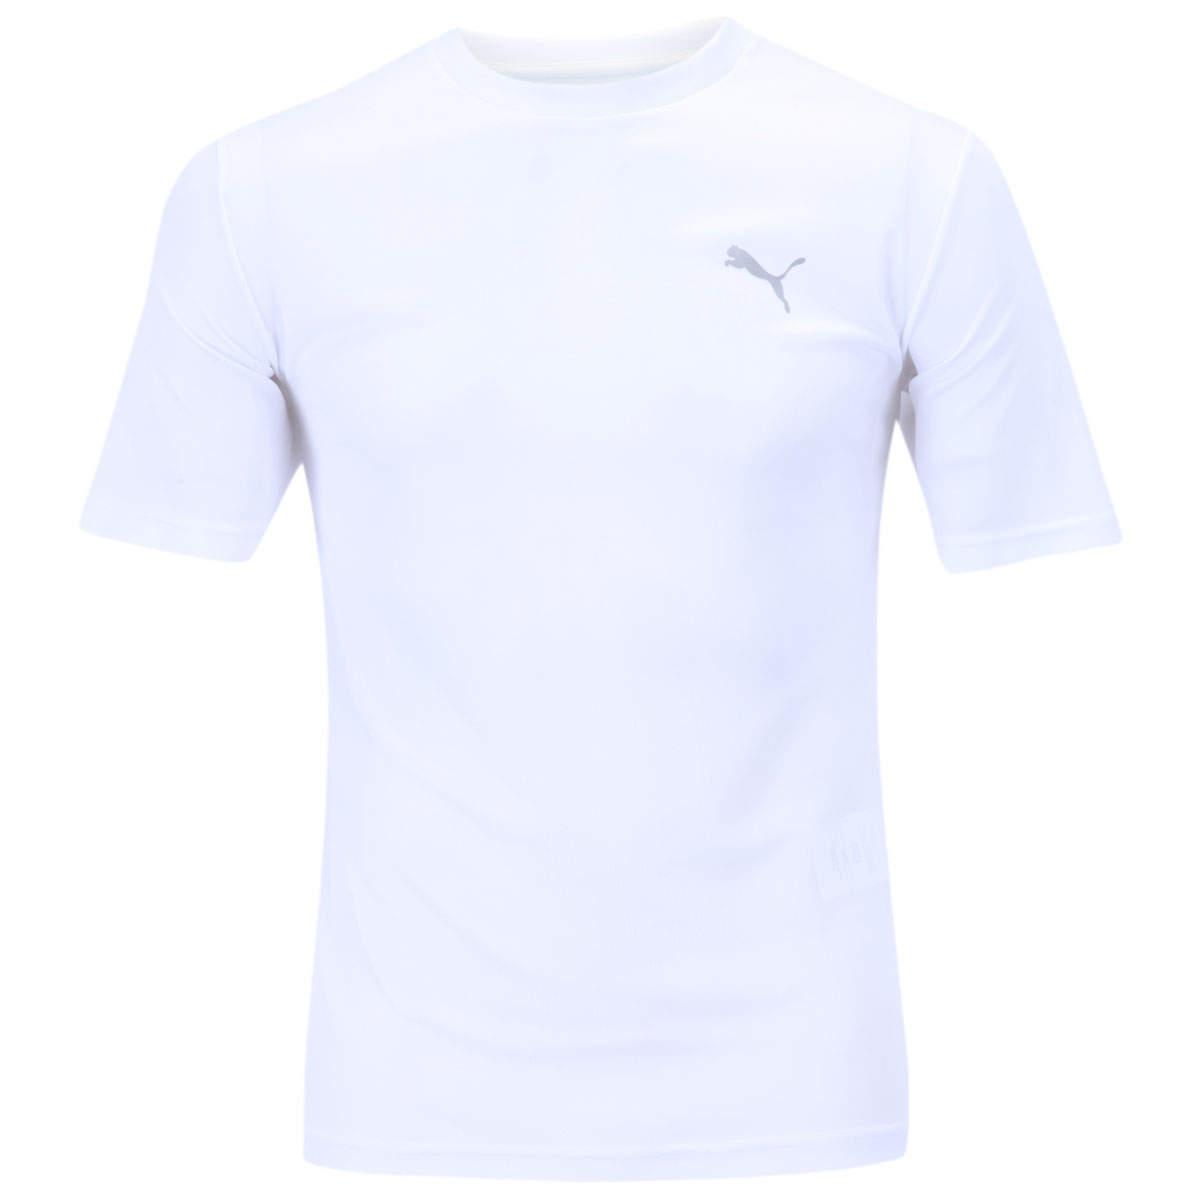 4c60979da3 Camiseta Puma Basic – Masculina - R  24